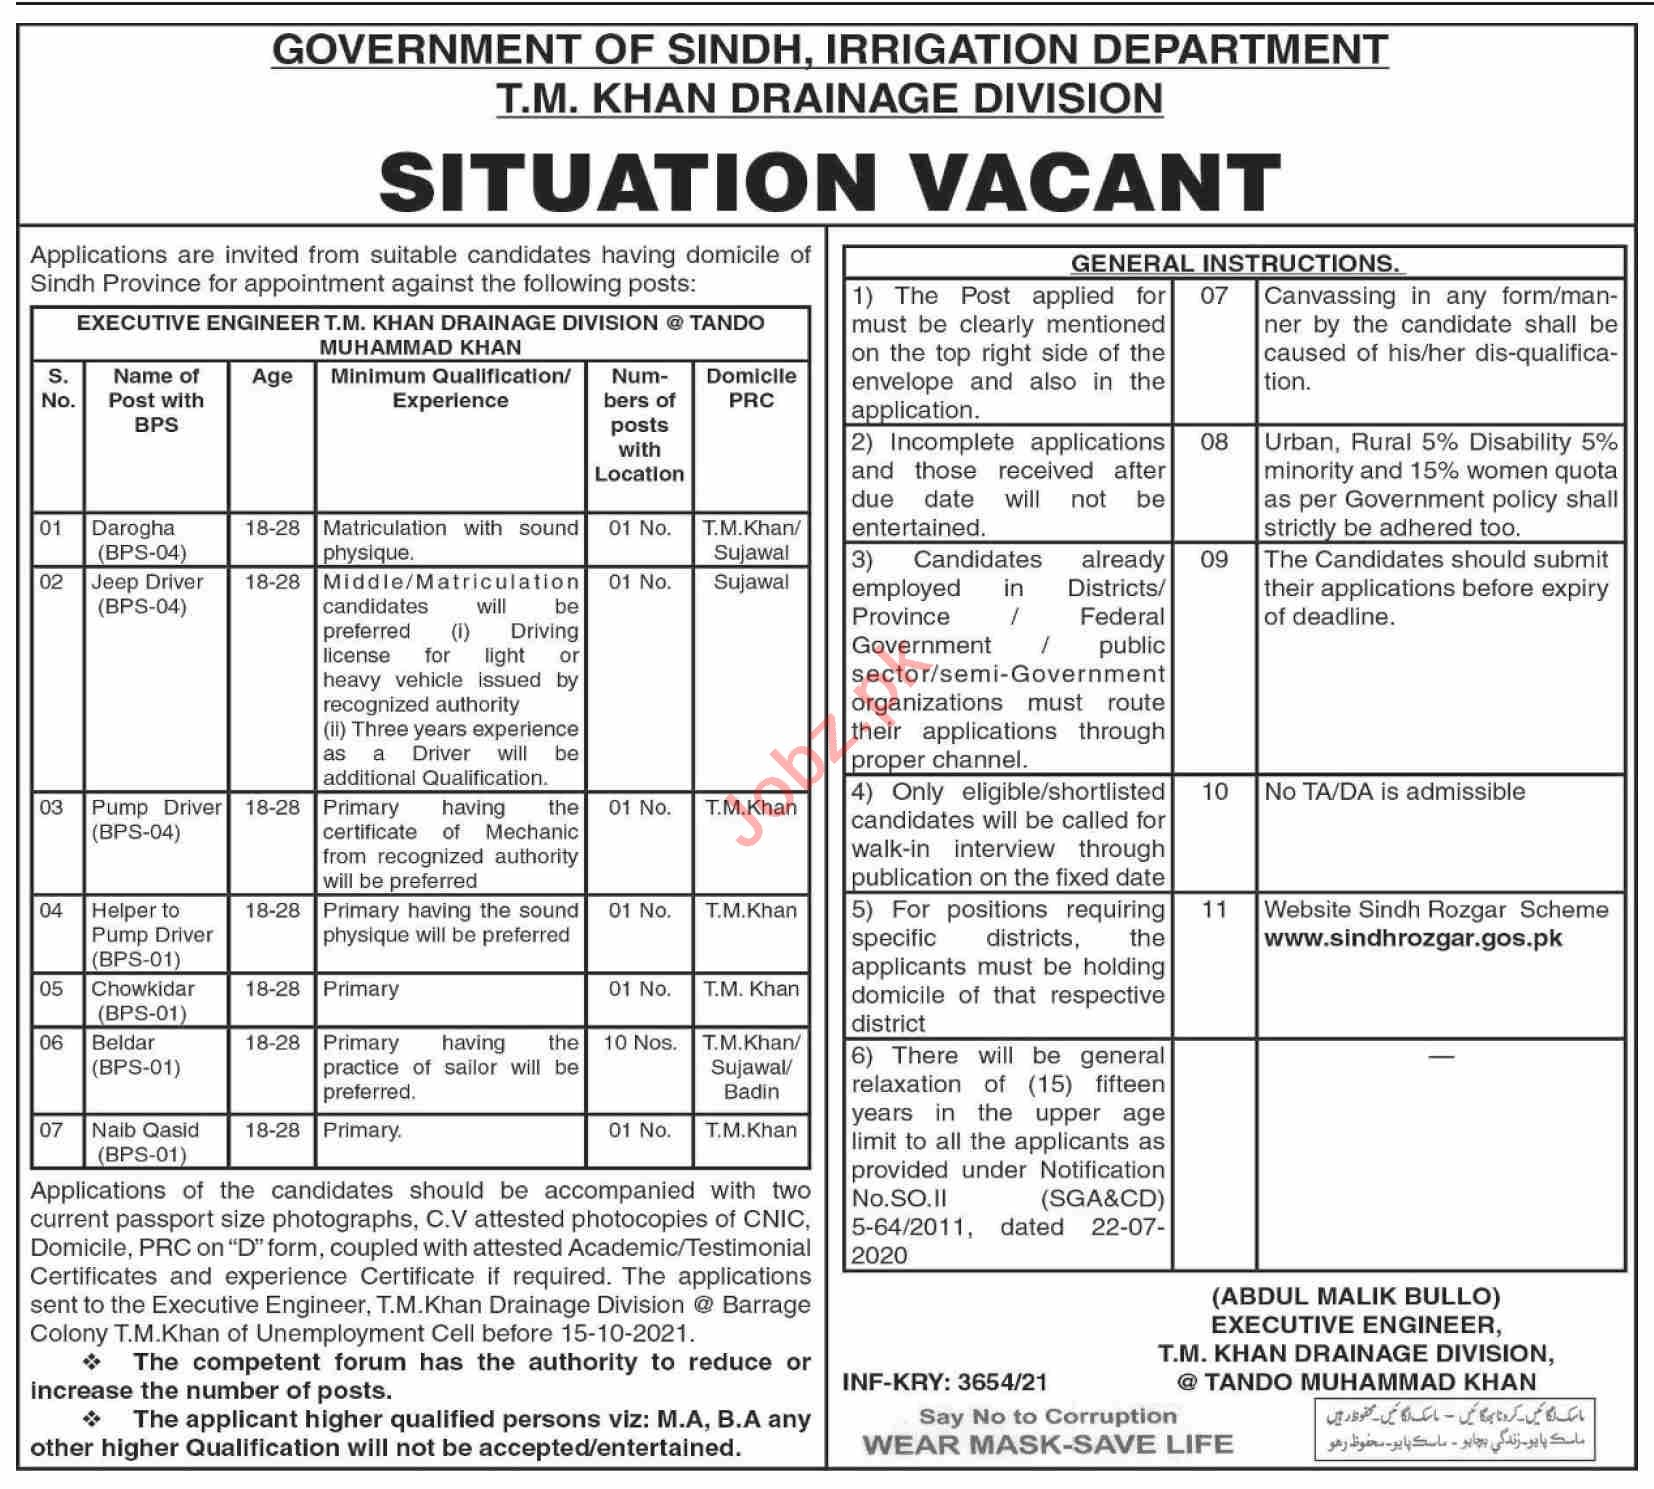 Irrigation Department Drainage Division TM Khan Jobs 2021